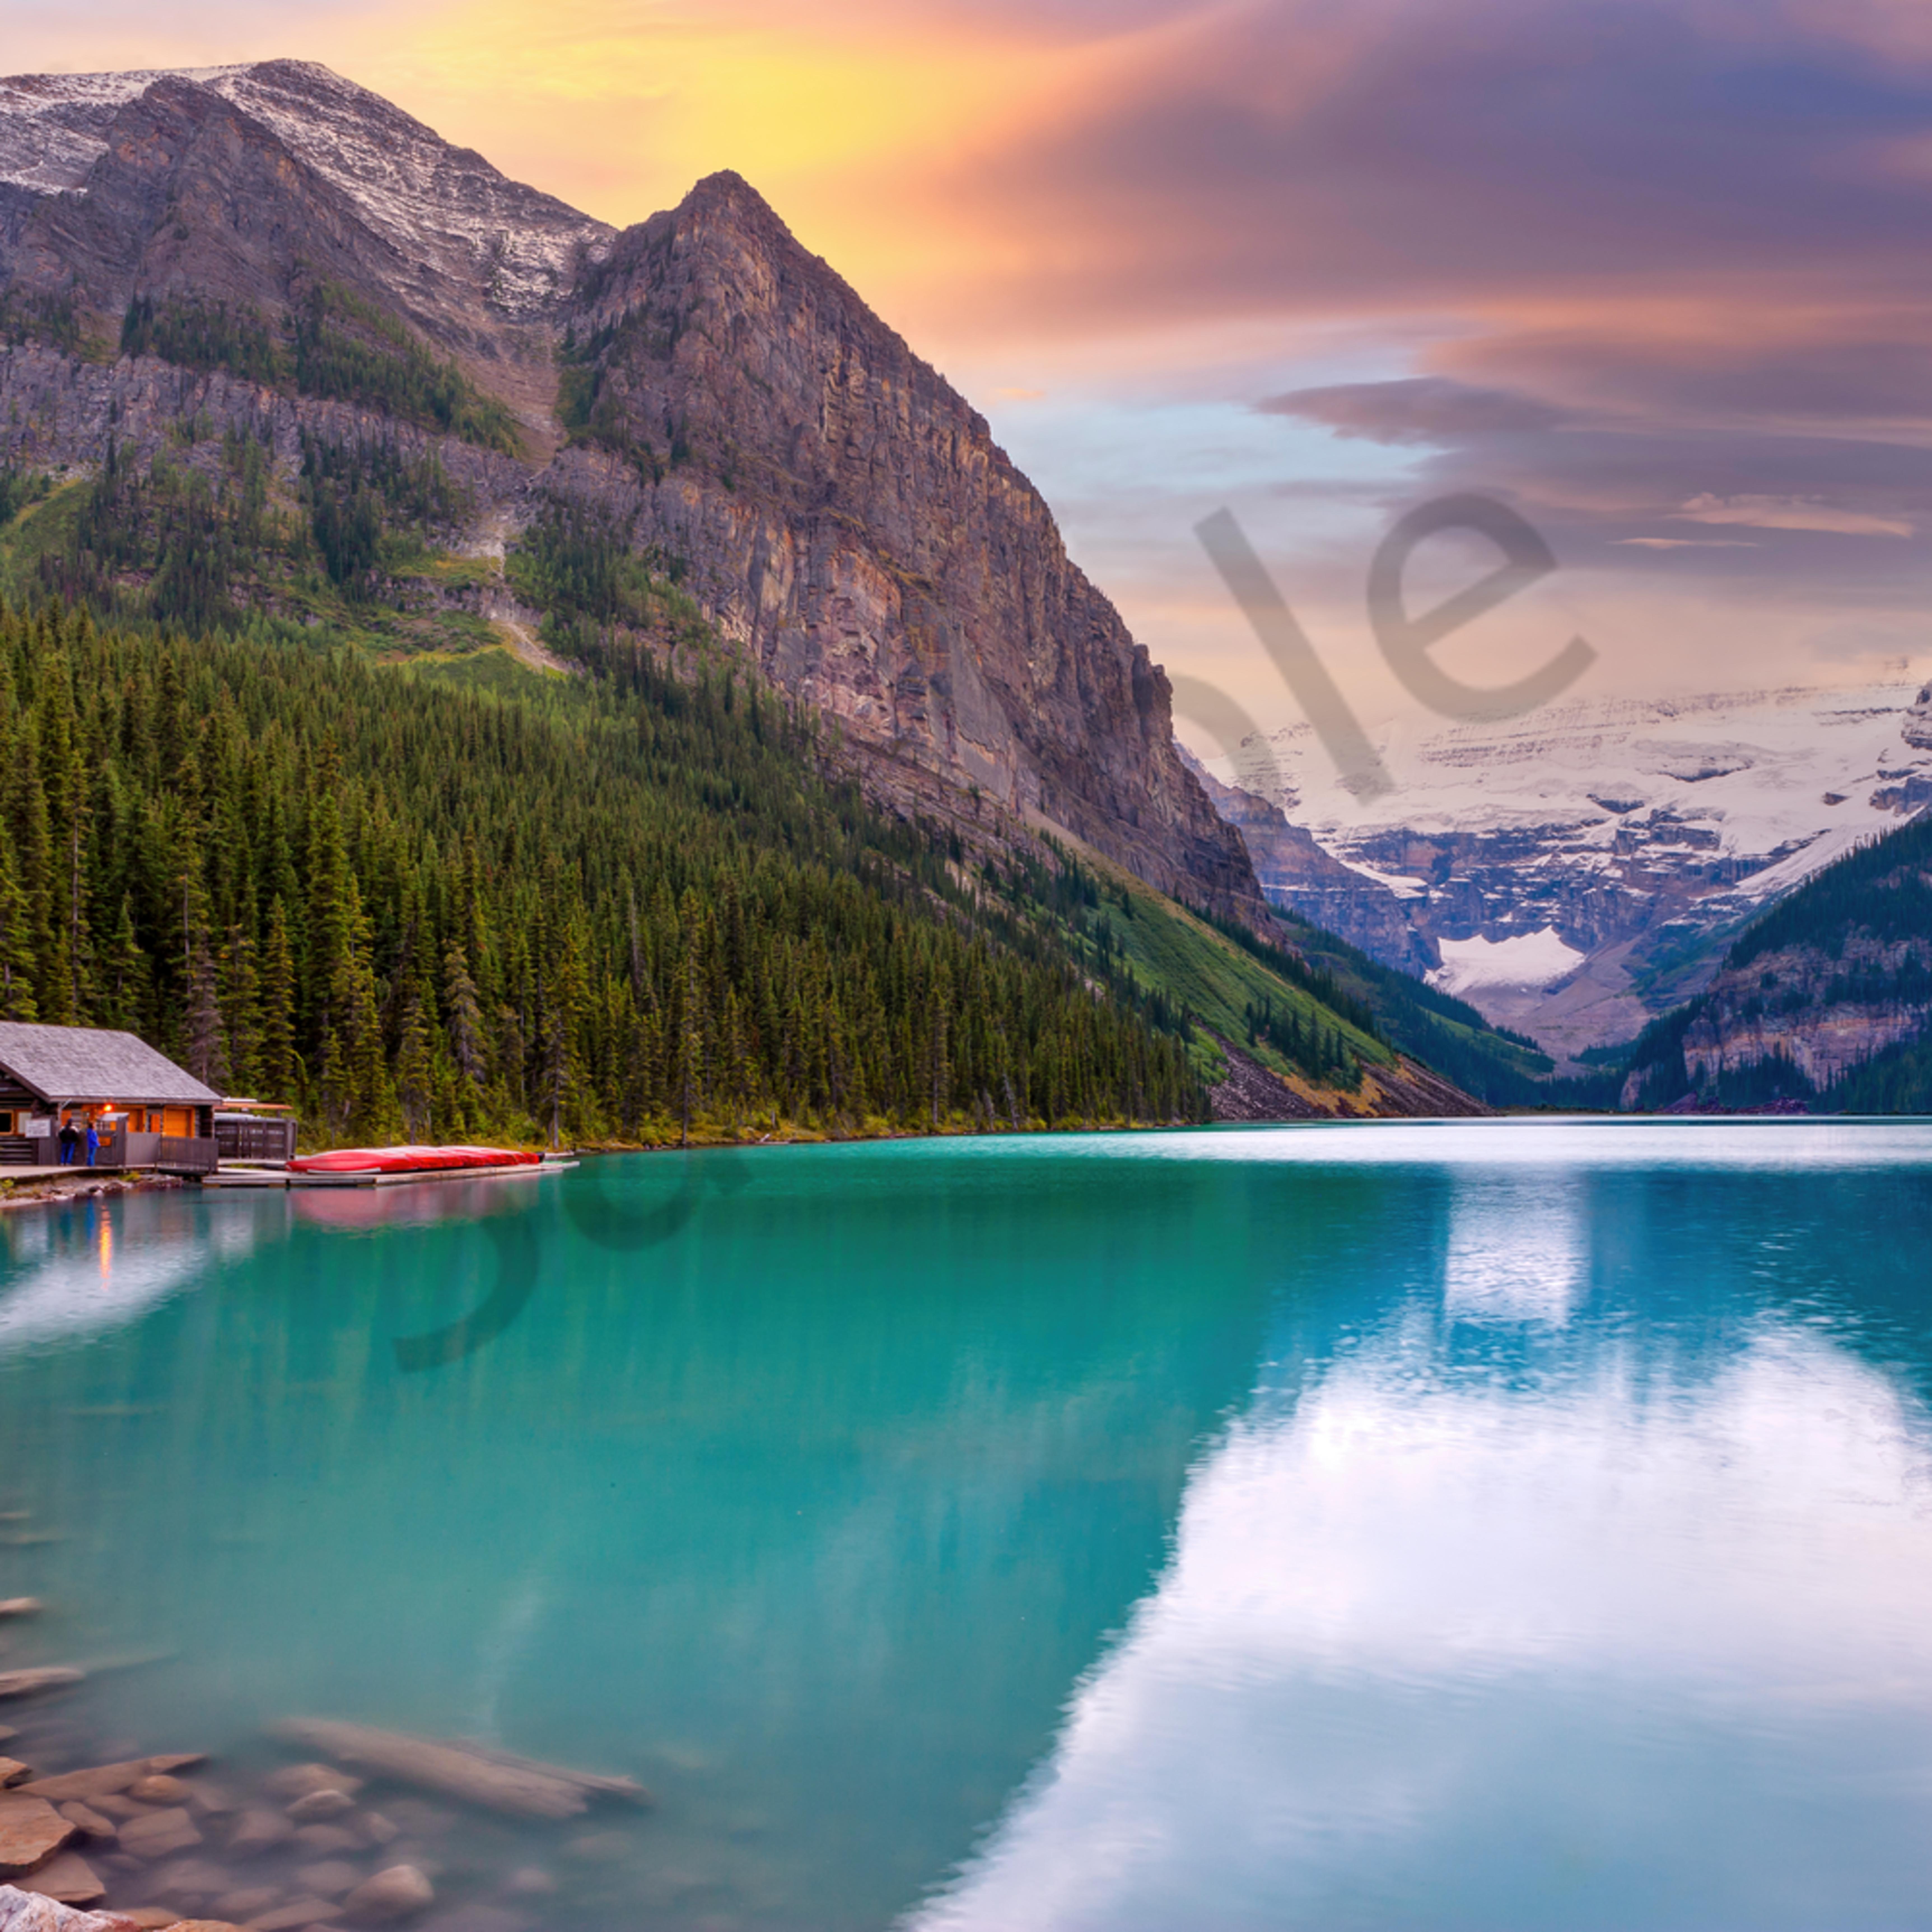 Lake louise banff national park alberta canada emei03